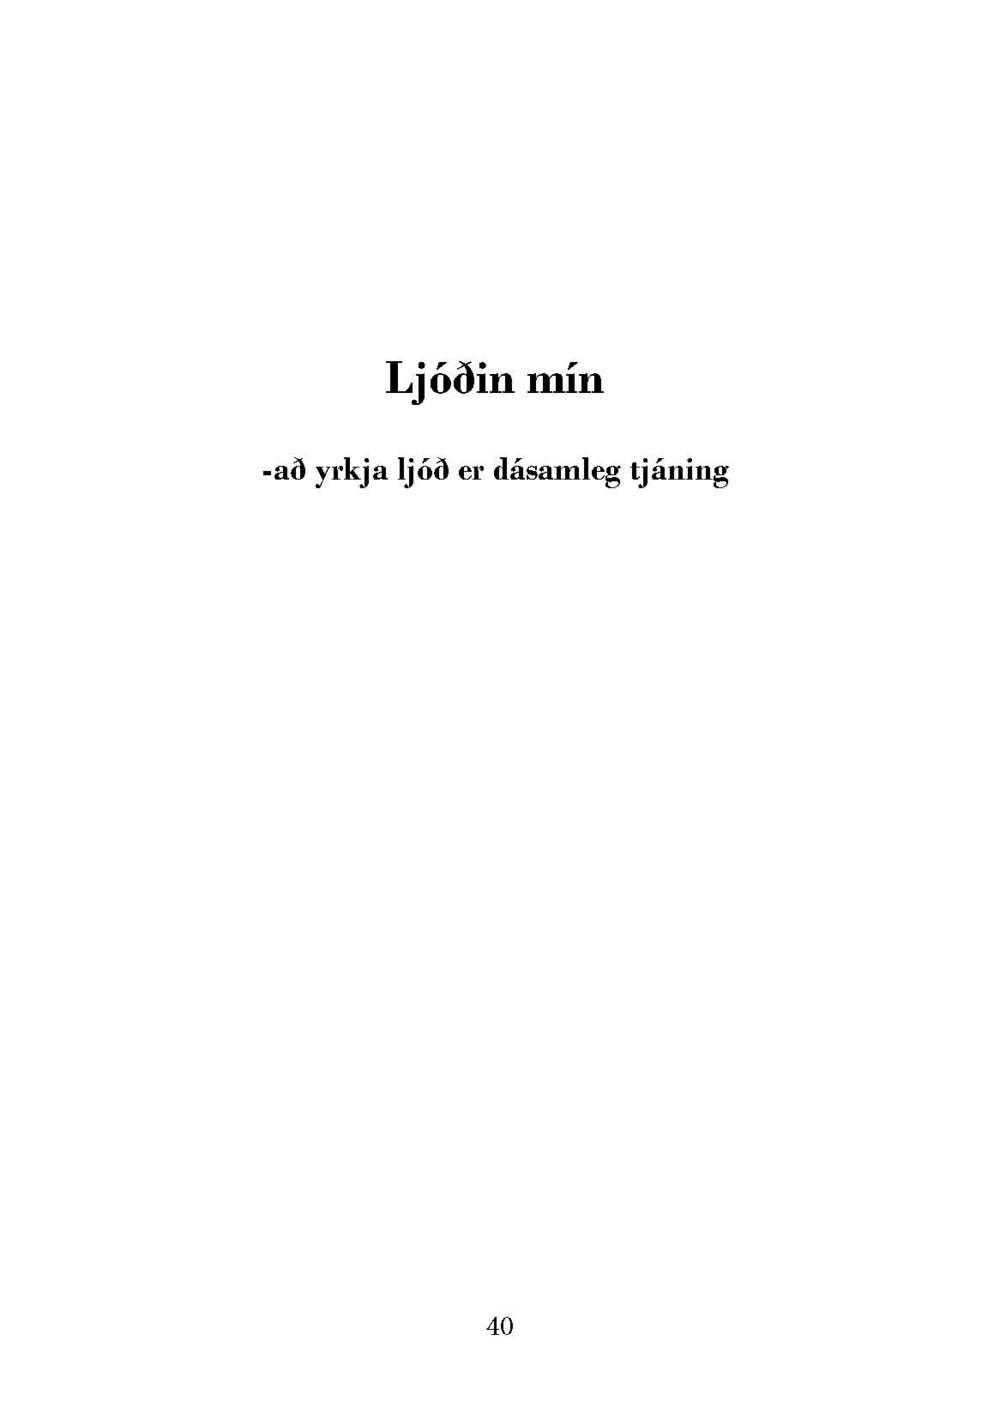 27073-ljodabokin--oll_Page_87.jpg